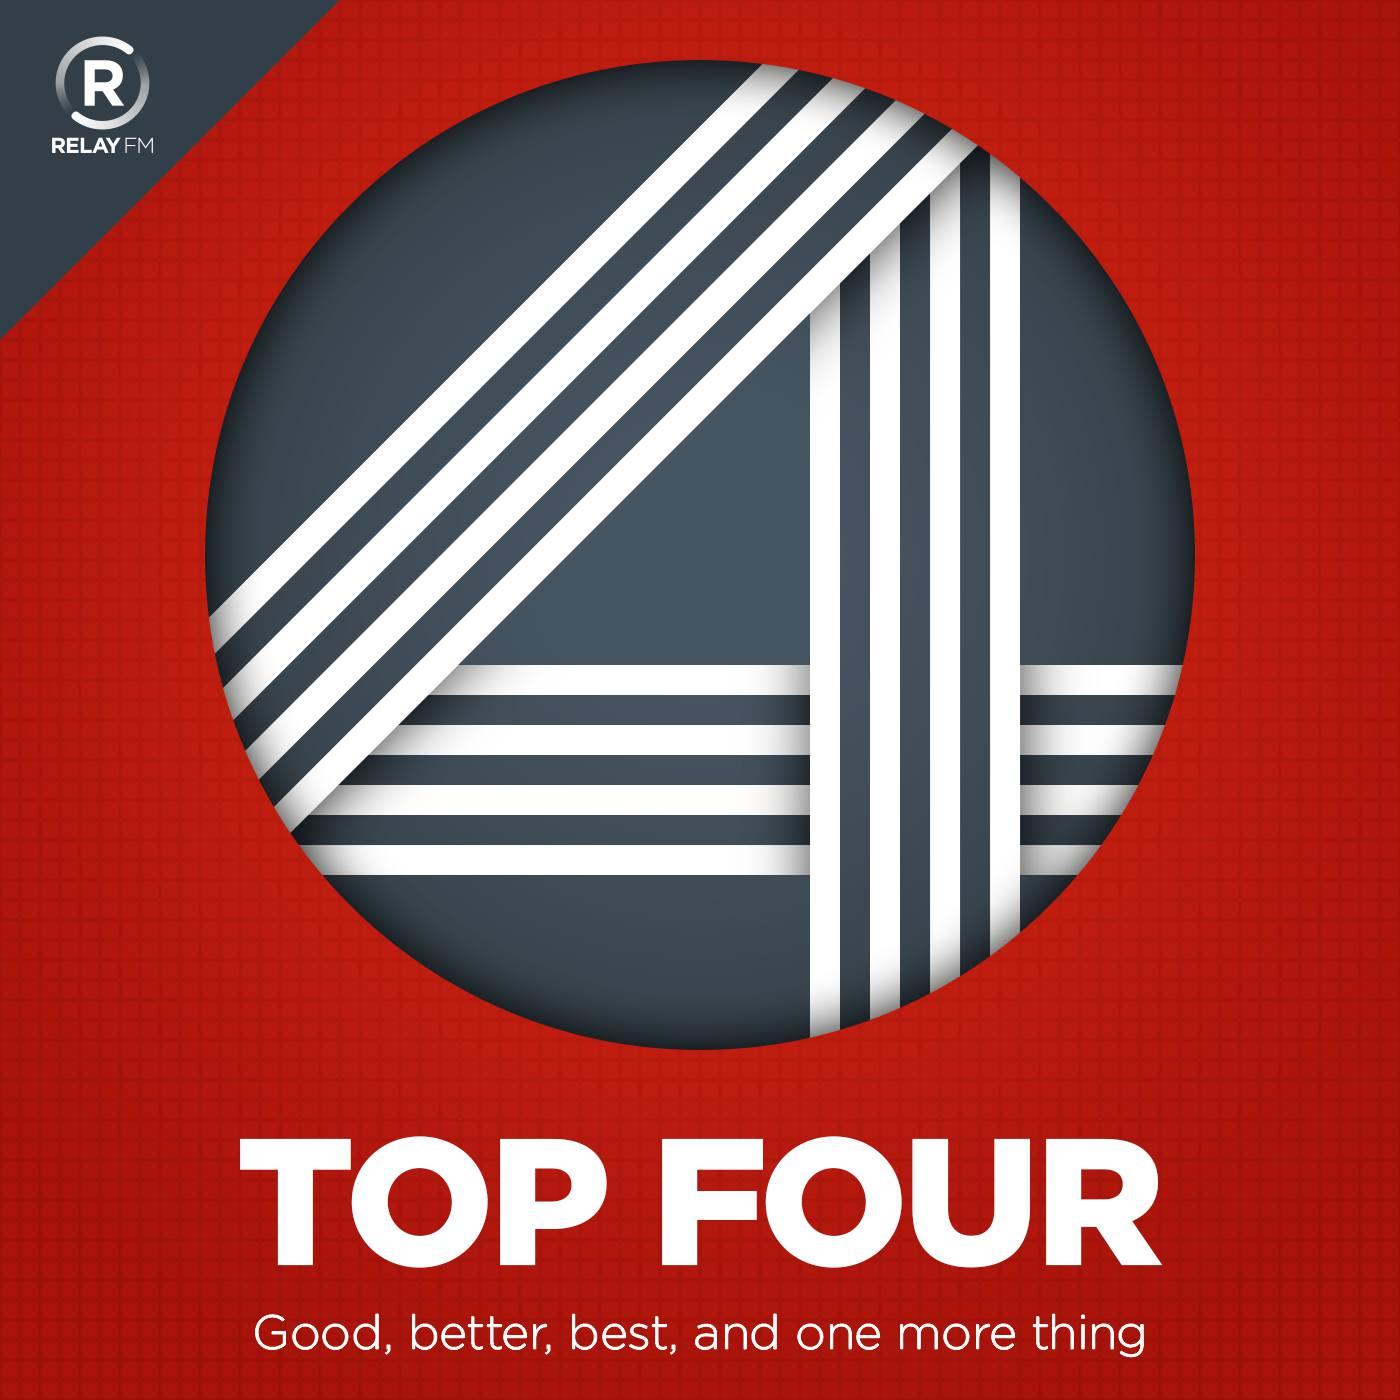 Top Four